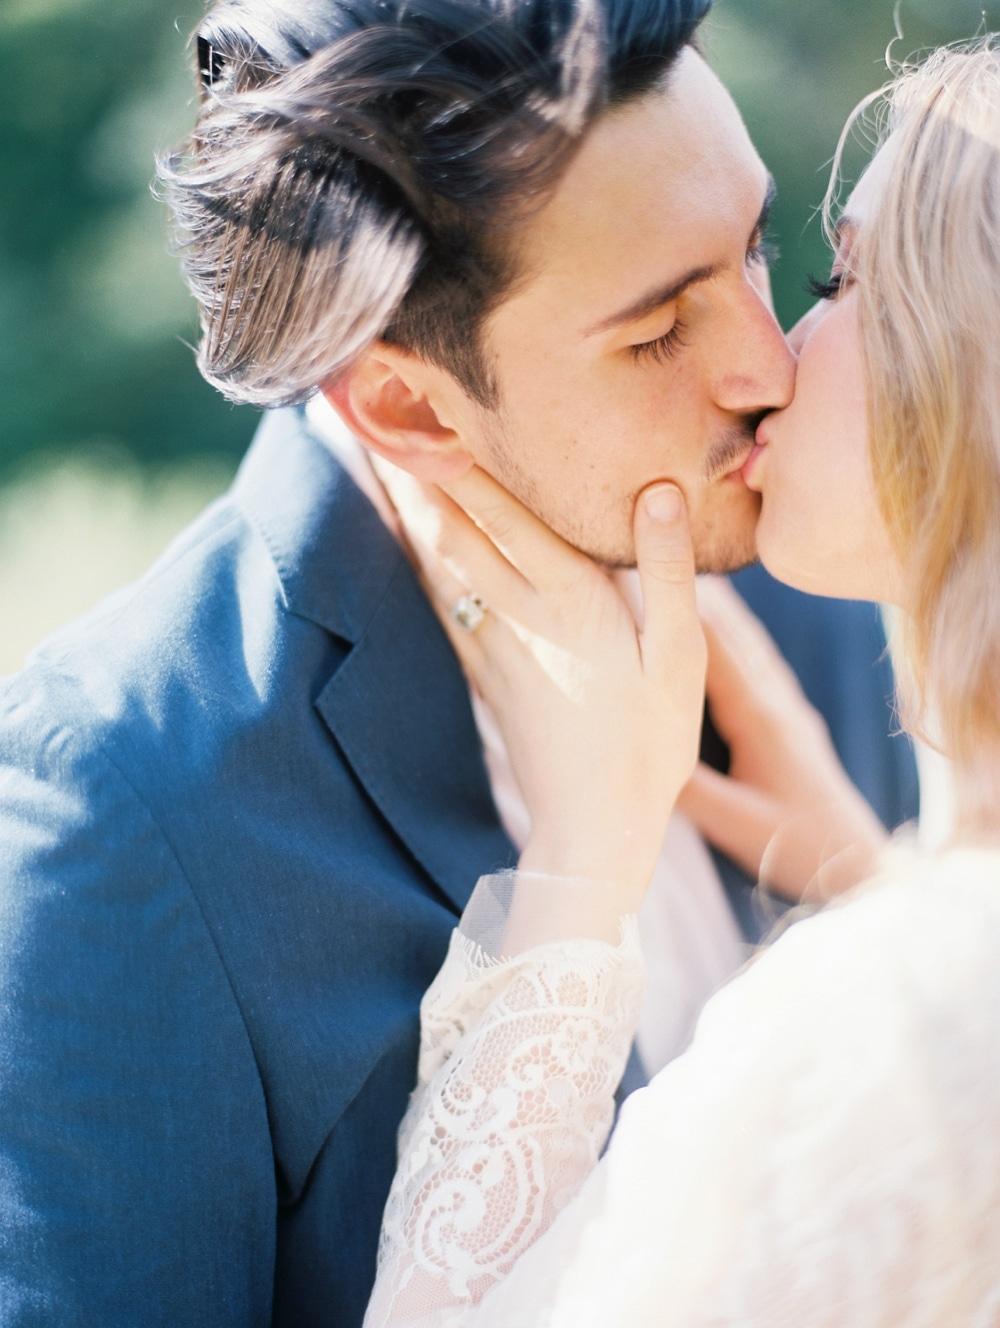 kristin-la-voie-photography-austin-wedding-photographer-72